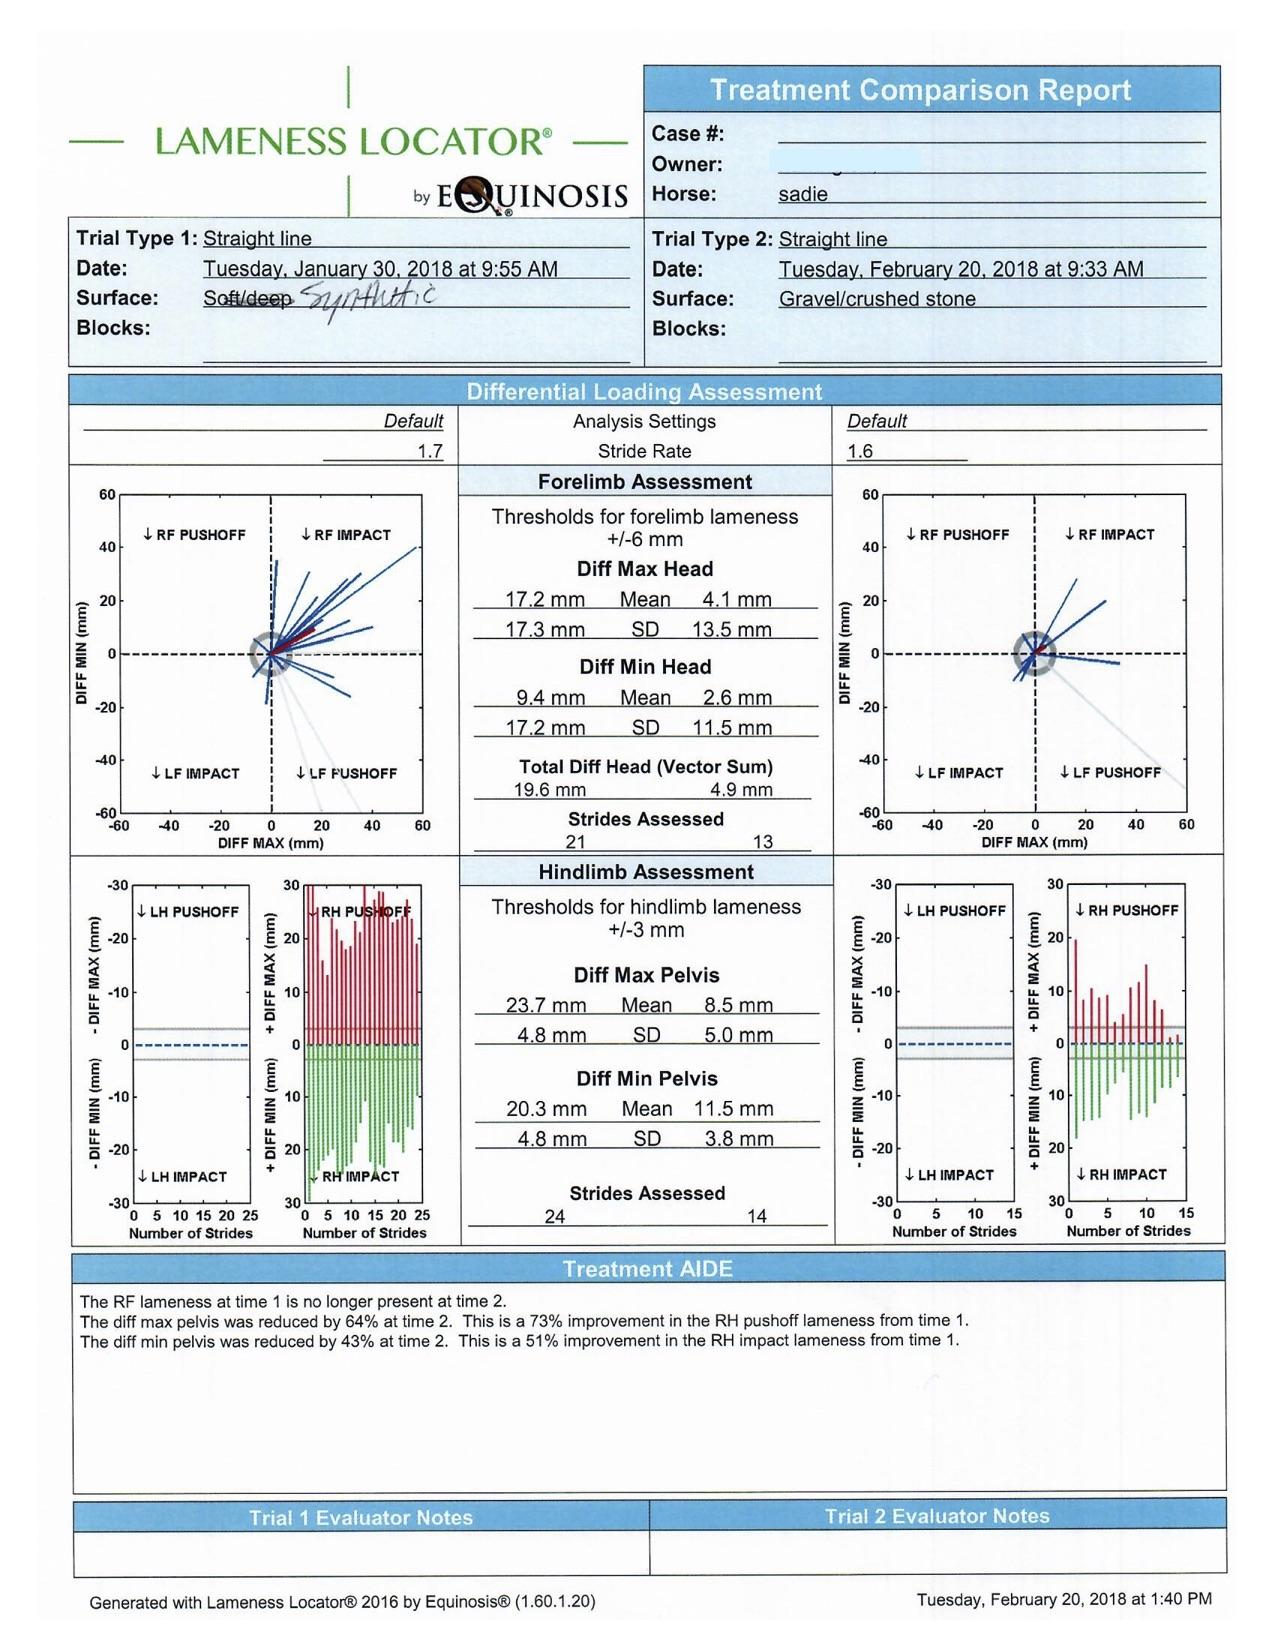 AJV Sadie Lameness Locator results.jpg